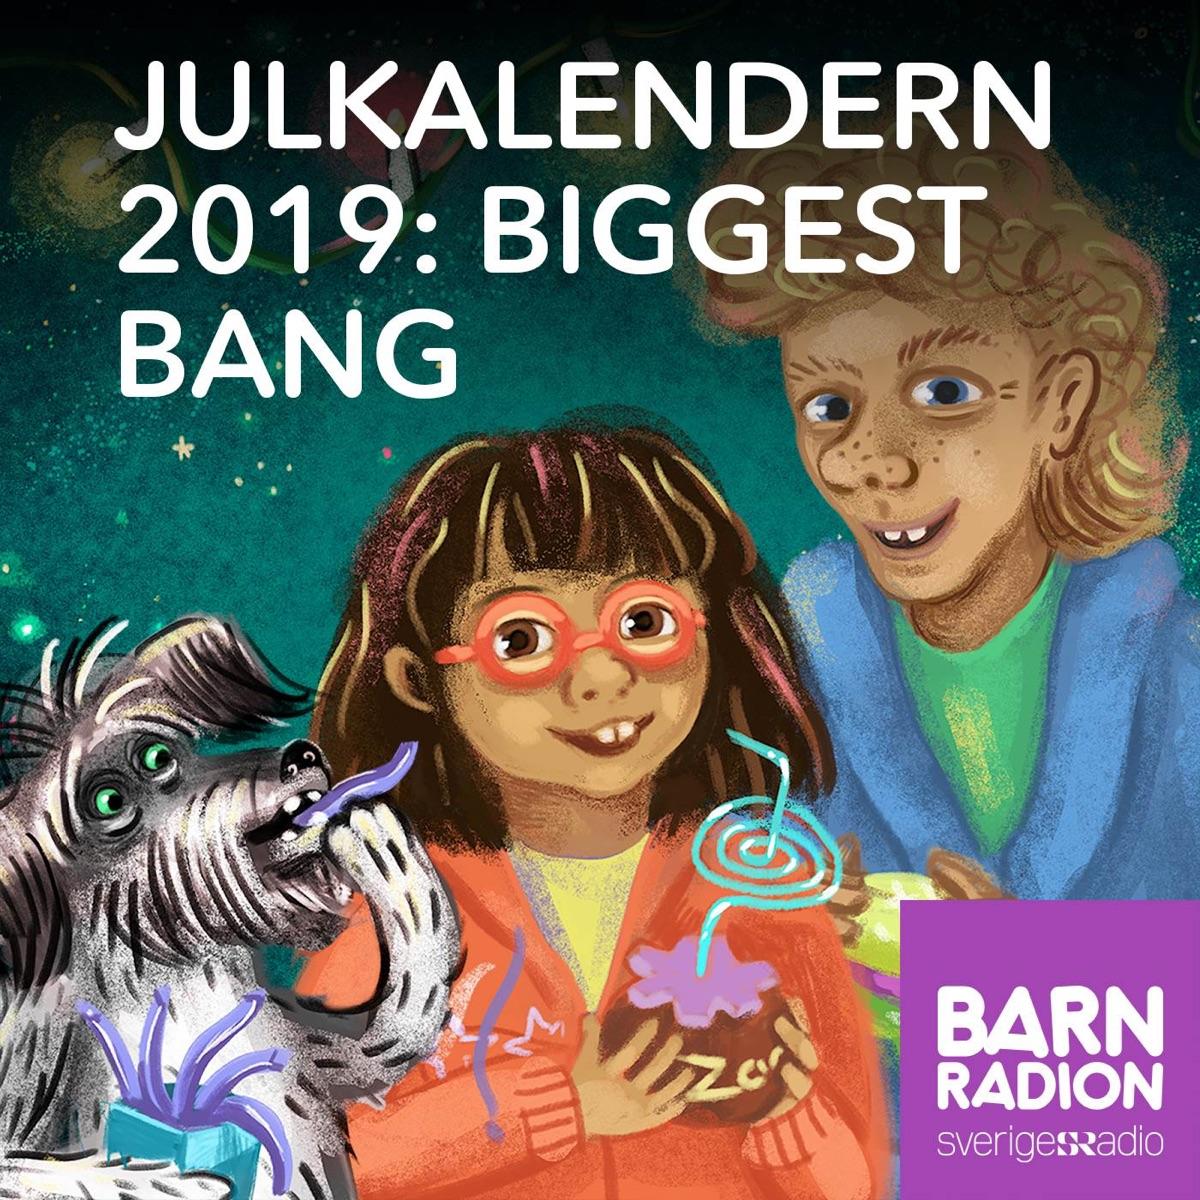 Julkalendern 2019: Biggest Bang